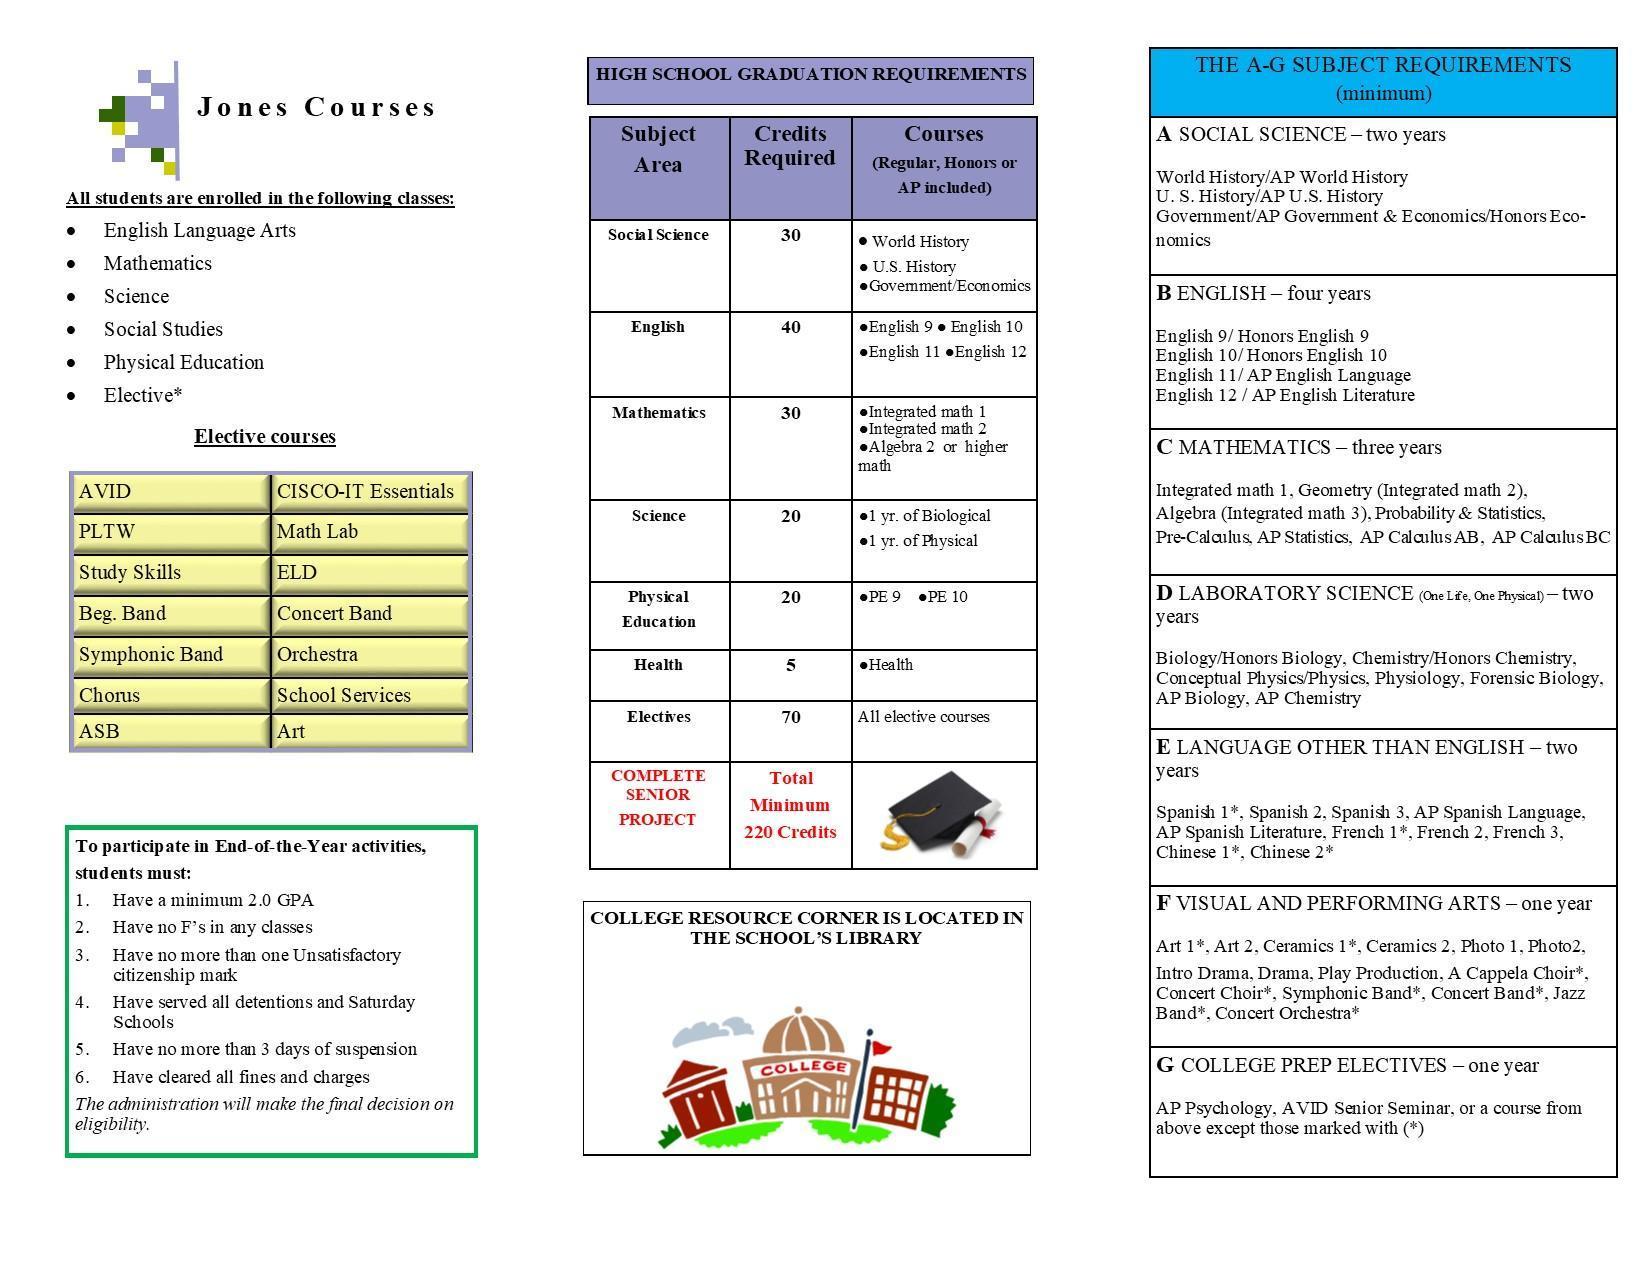 Jones pamphlet (b) 19-20